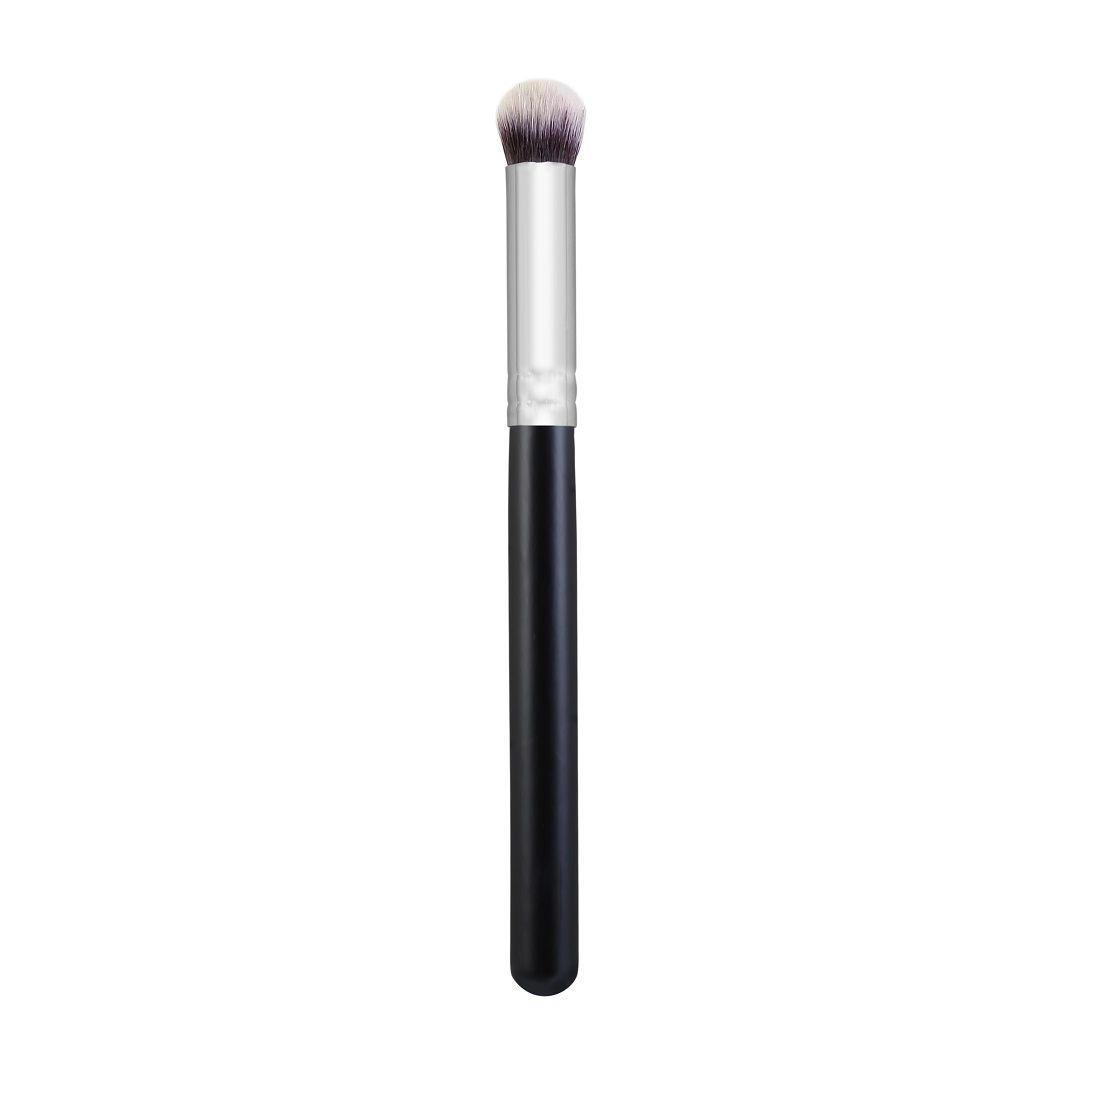 Morphe Mini Buffer Brush M173